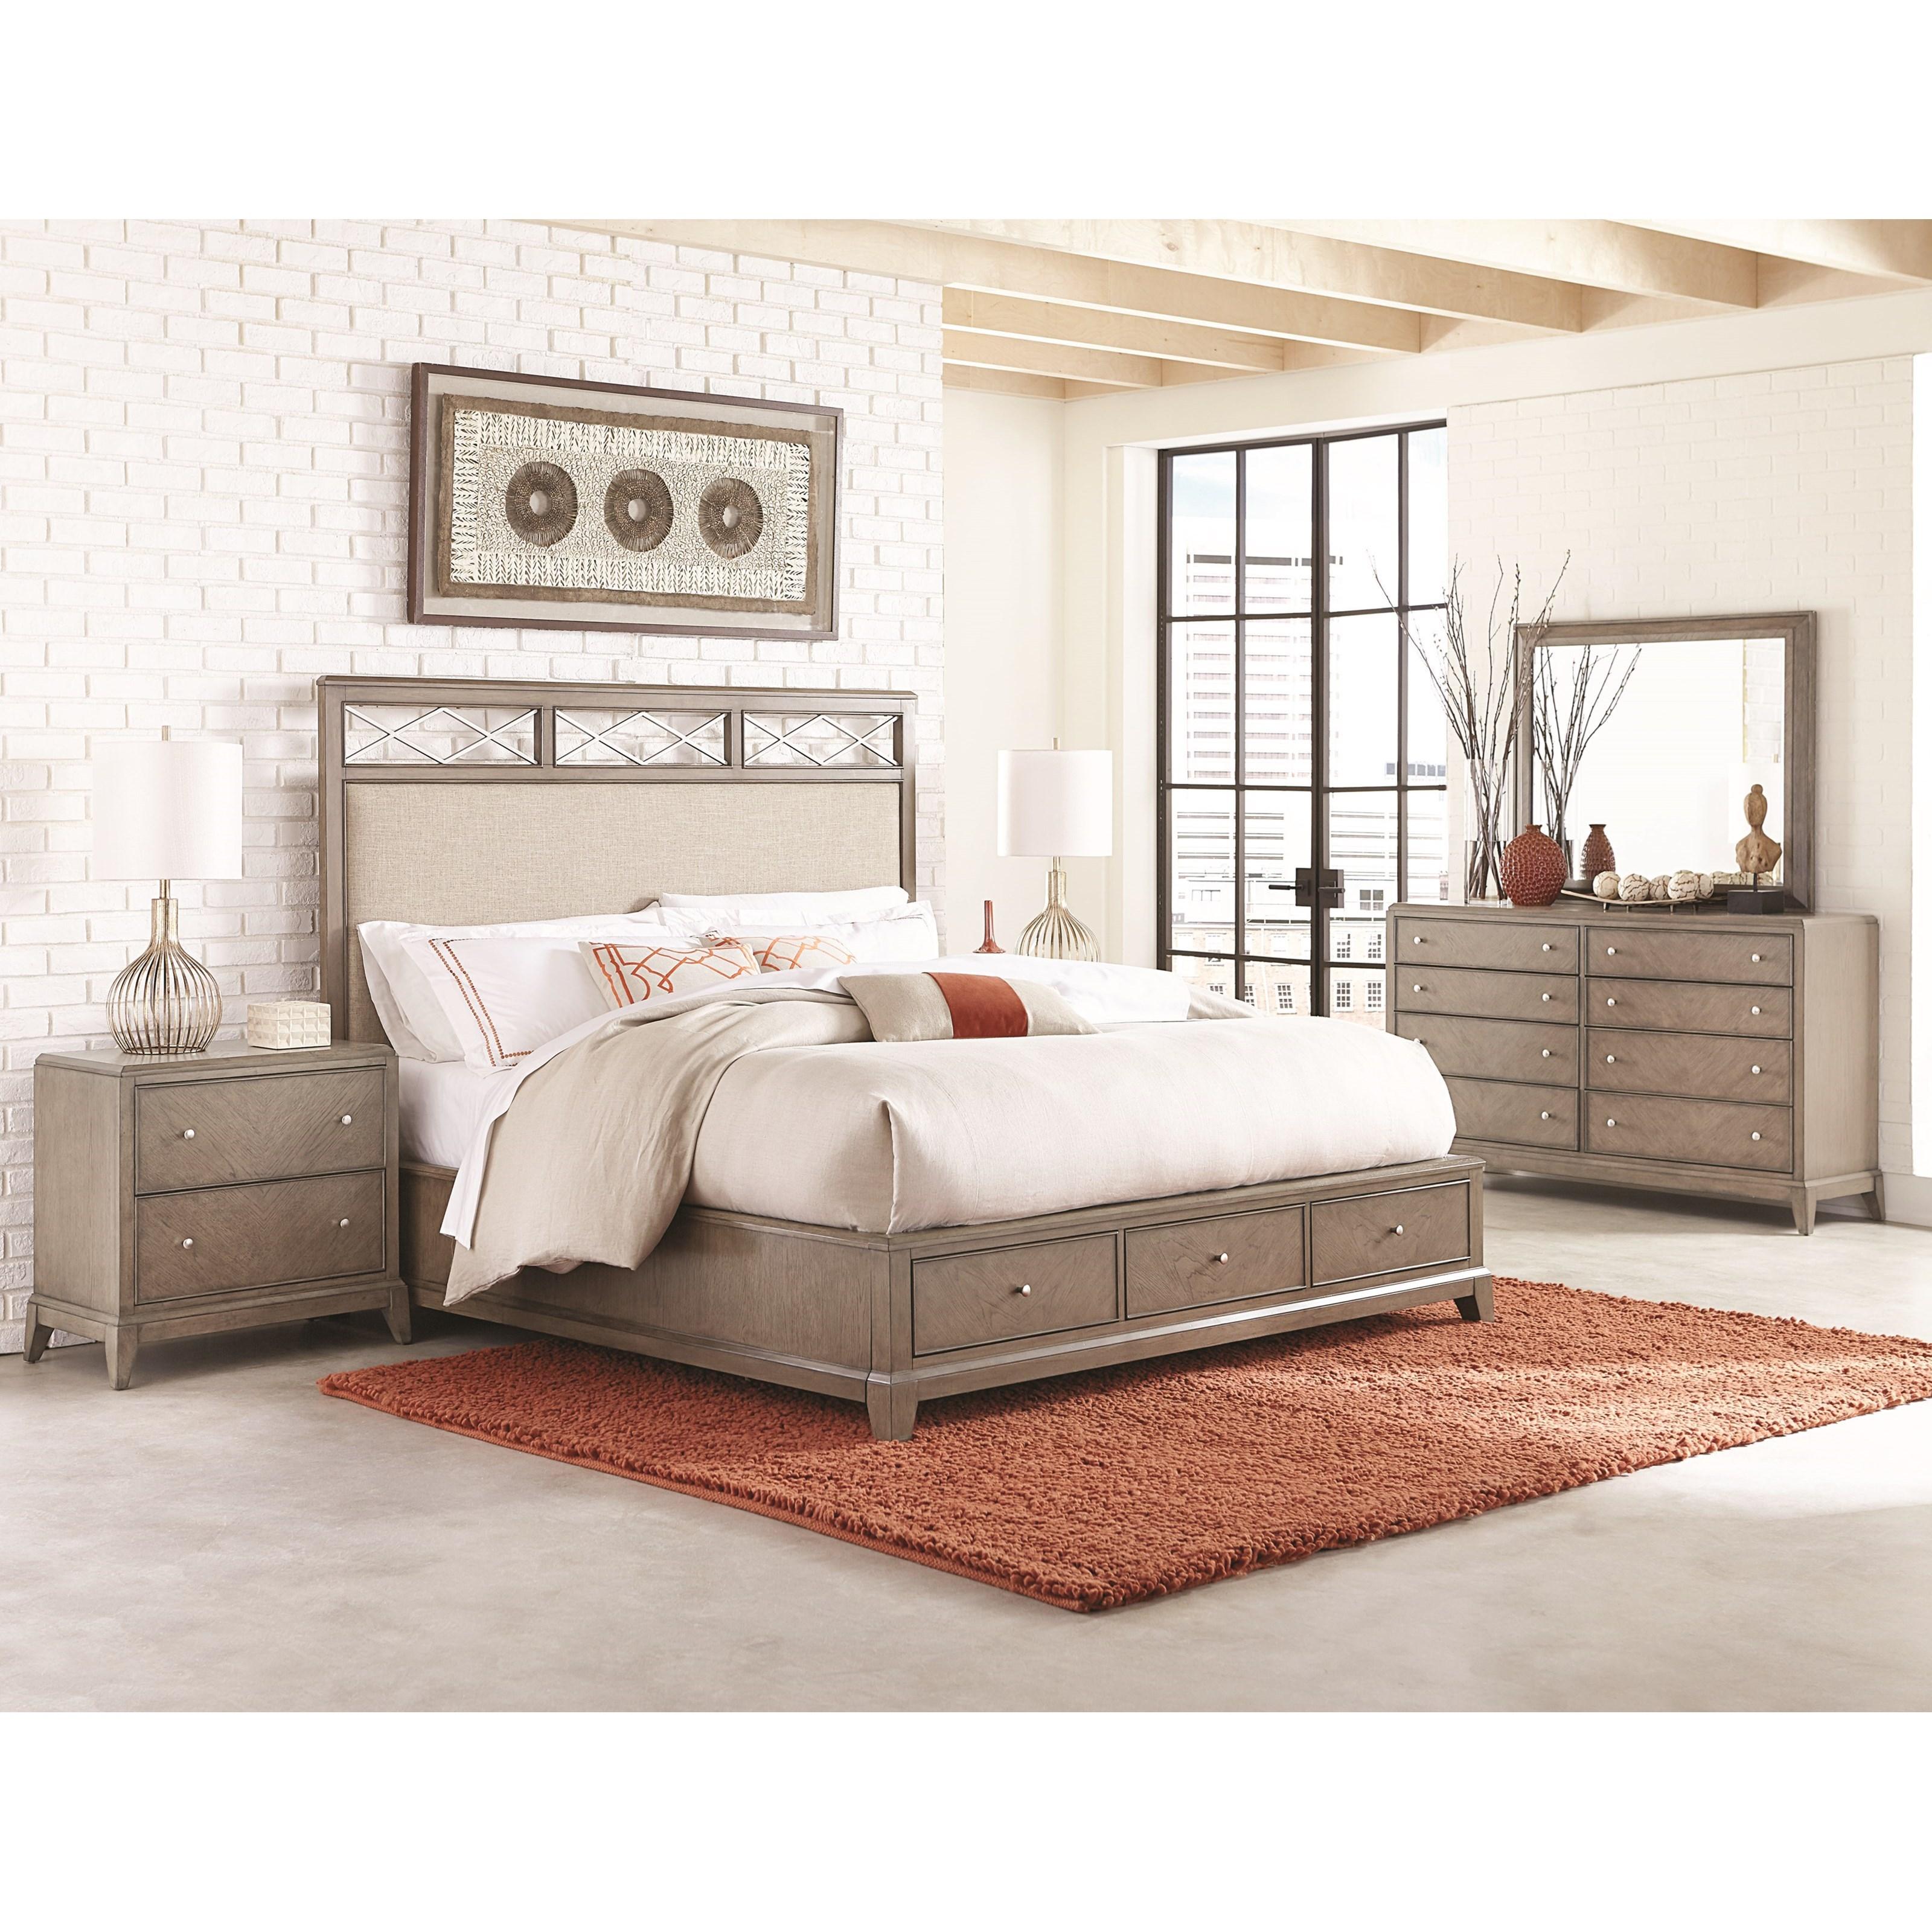 Legacy Classic Apex Queen Bedroom Group - Item Number: 7700 Q Bedroom Group 2